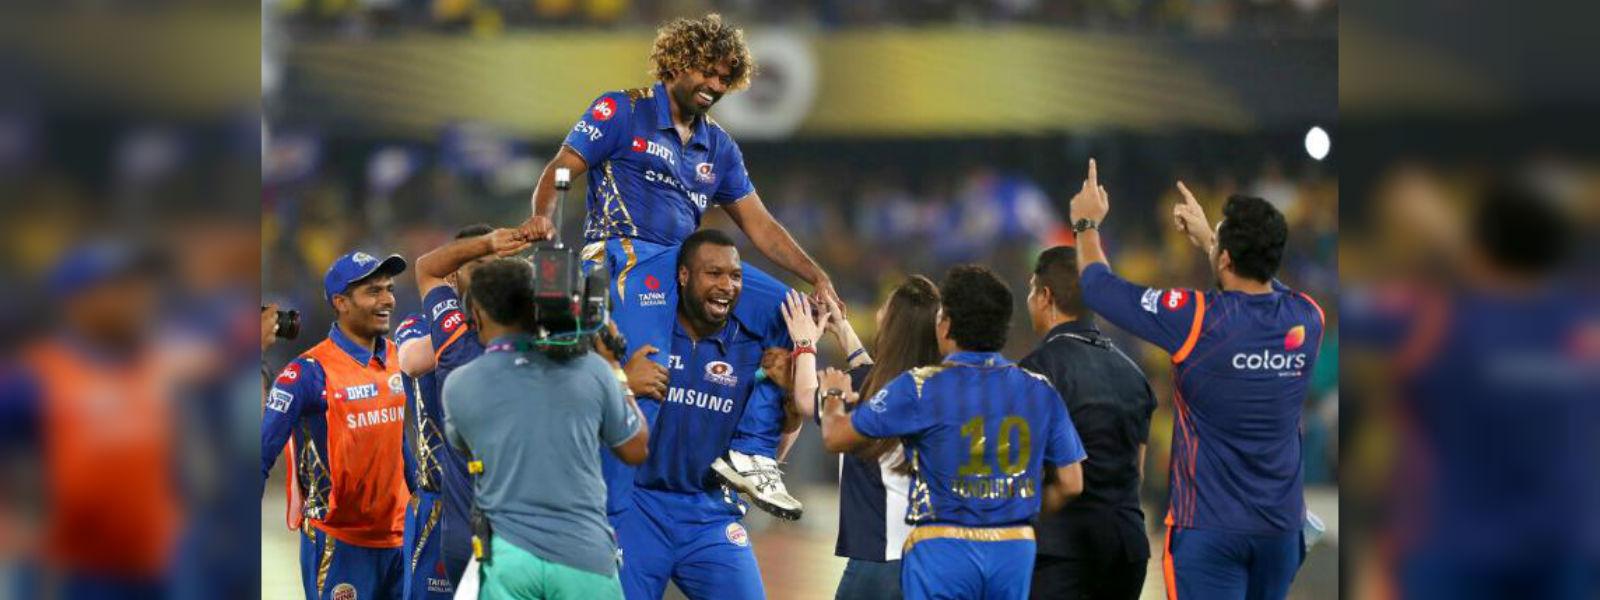 Malinga ensures 4th IPL victory for Mumbai Indians